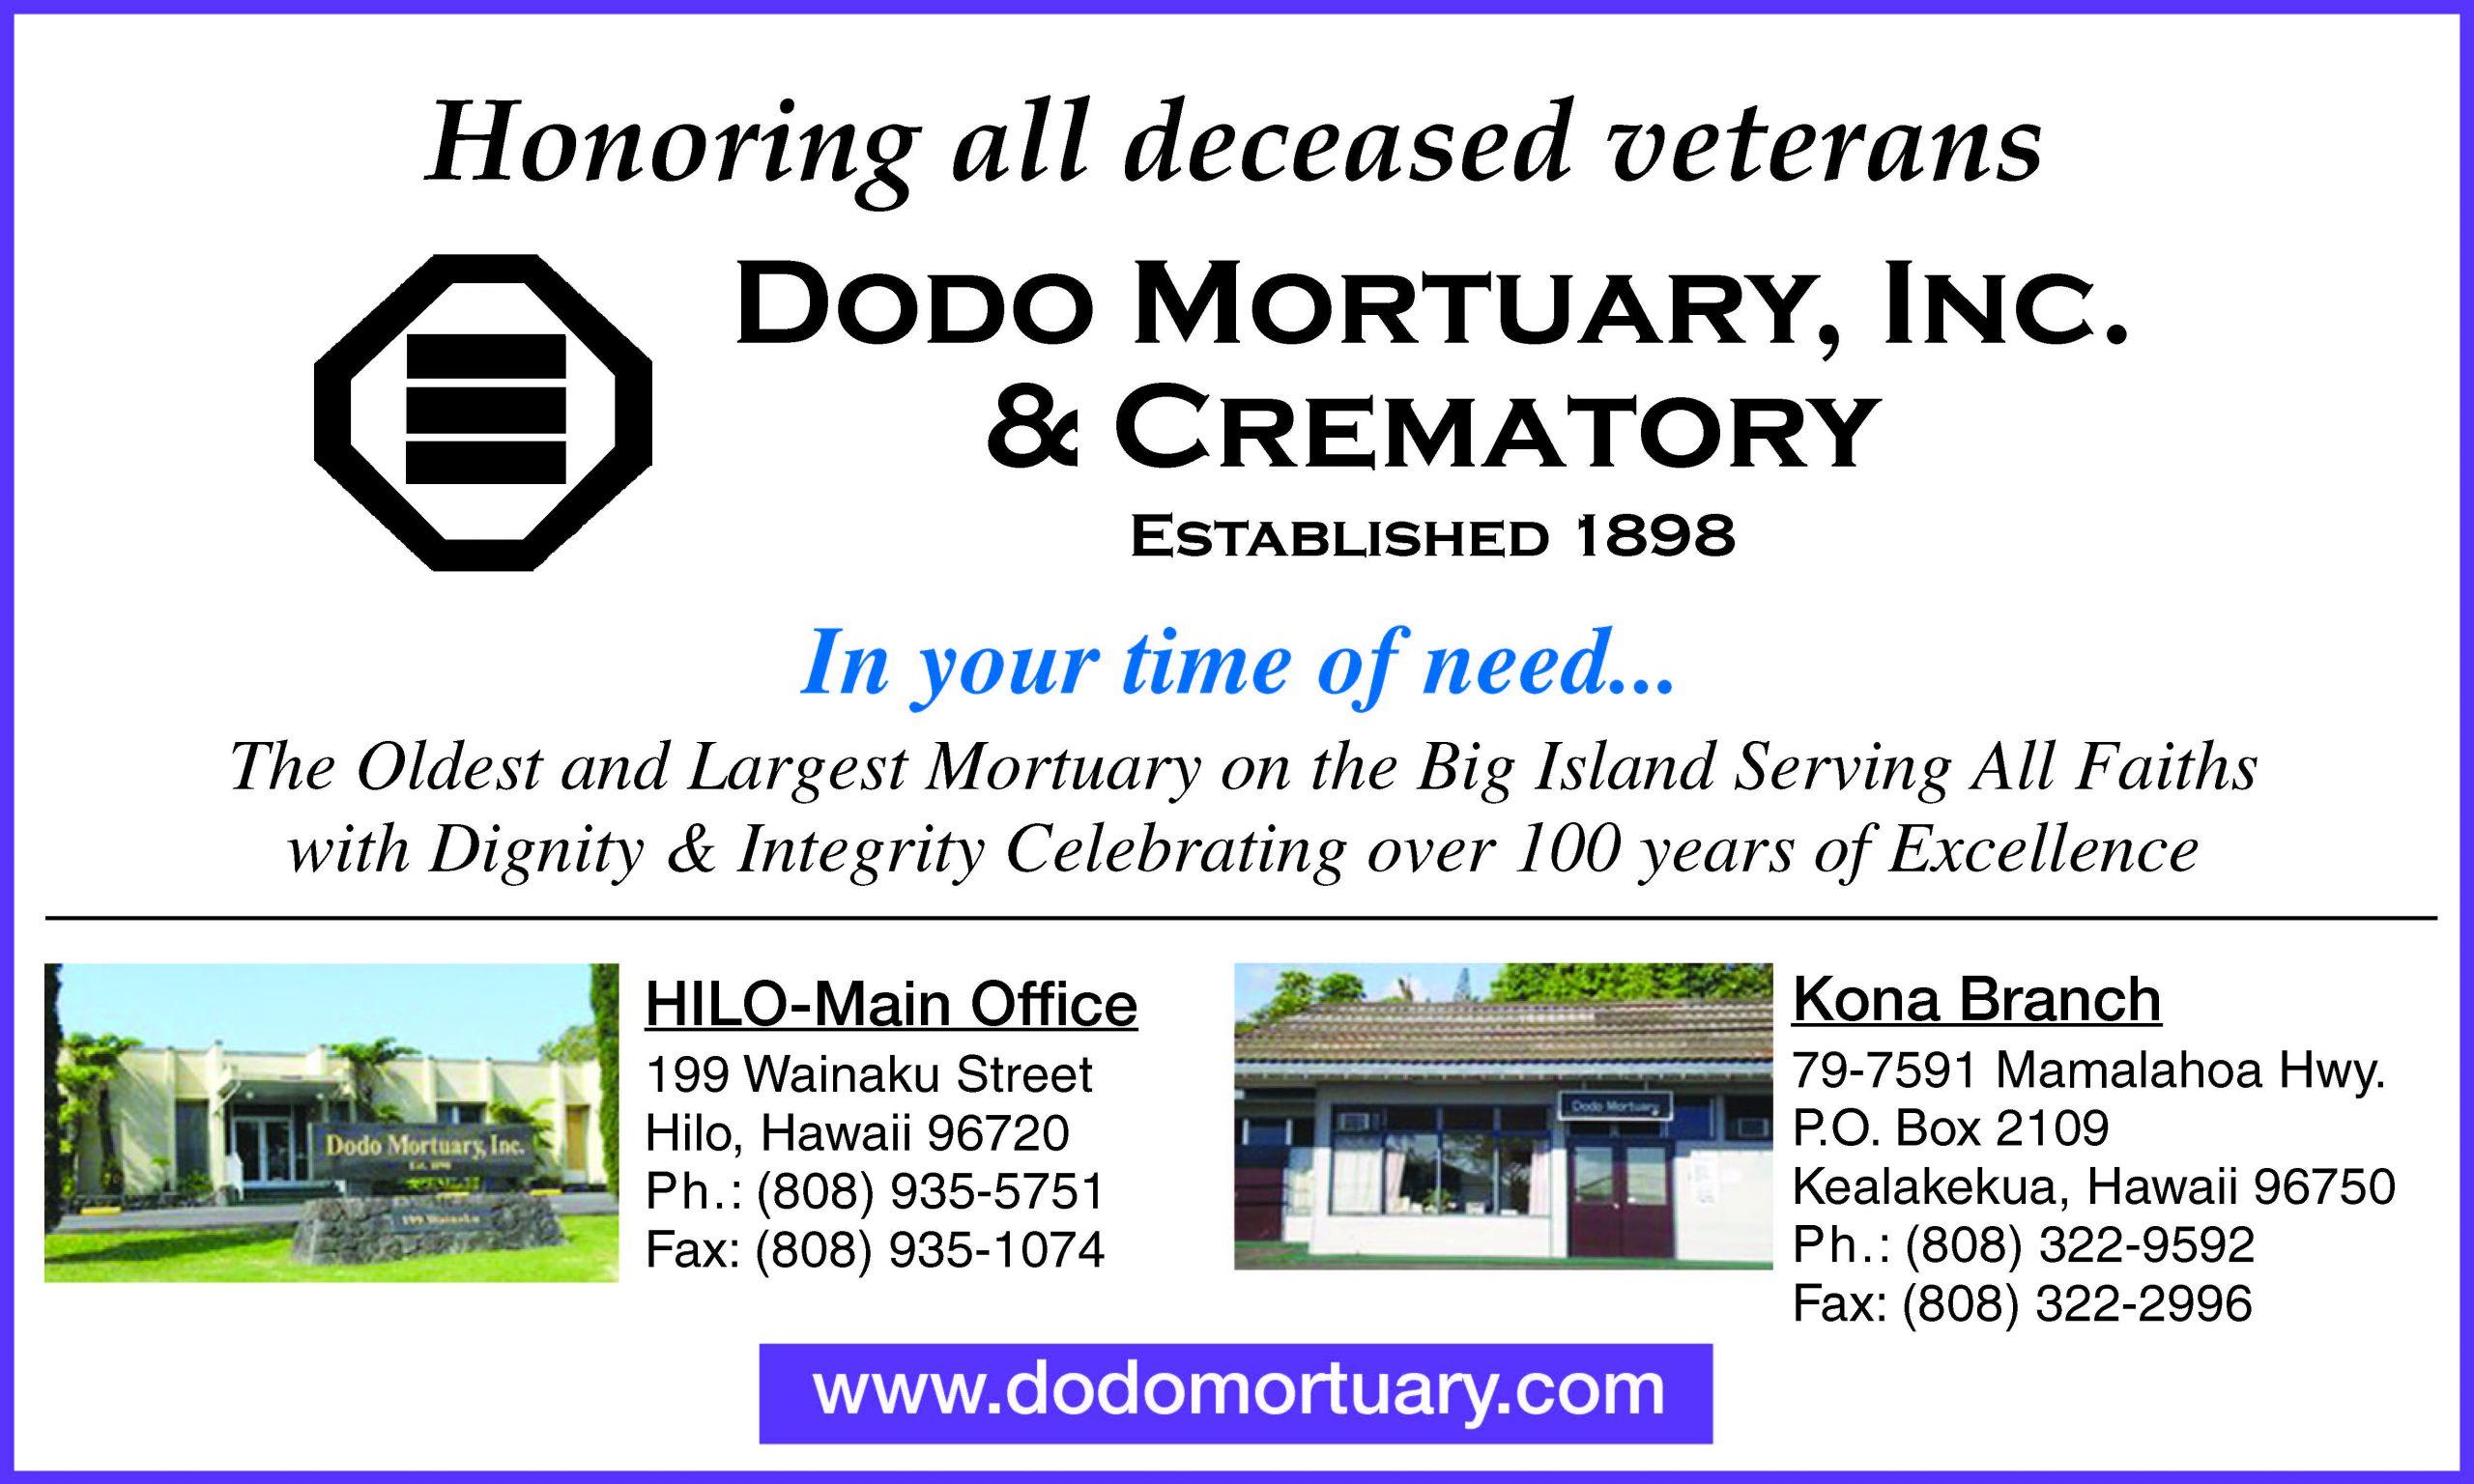 Dodo Mortuary Memorial Day ad